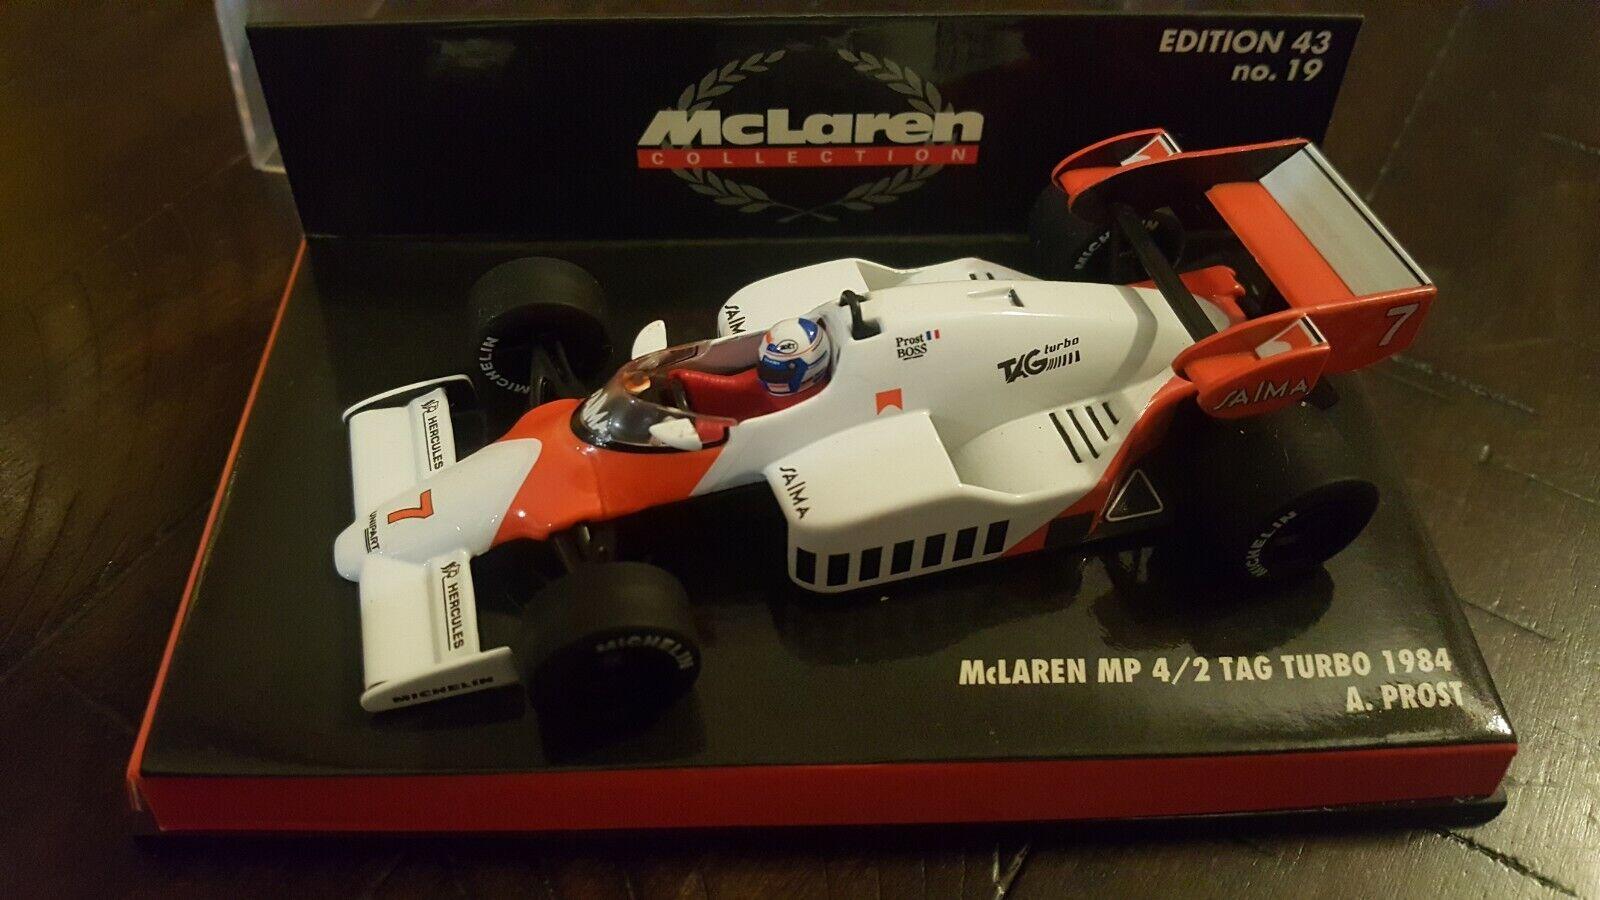 McLaren MP4//2 Lauda 1984 #8 1:43 RBA-Blister Modellauto